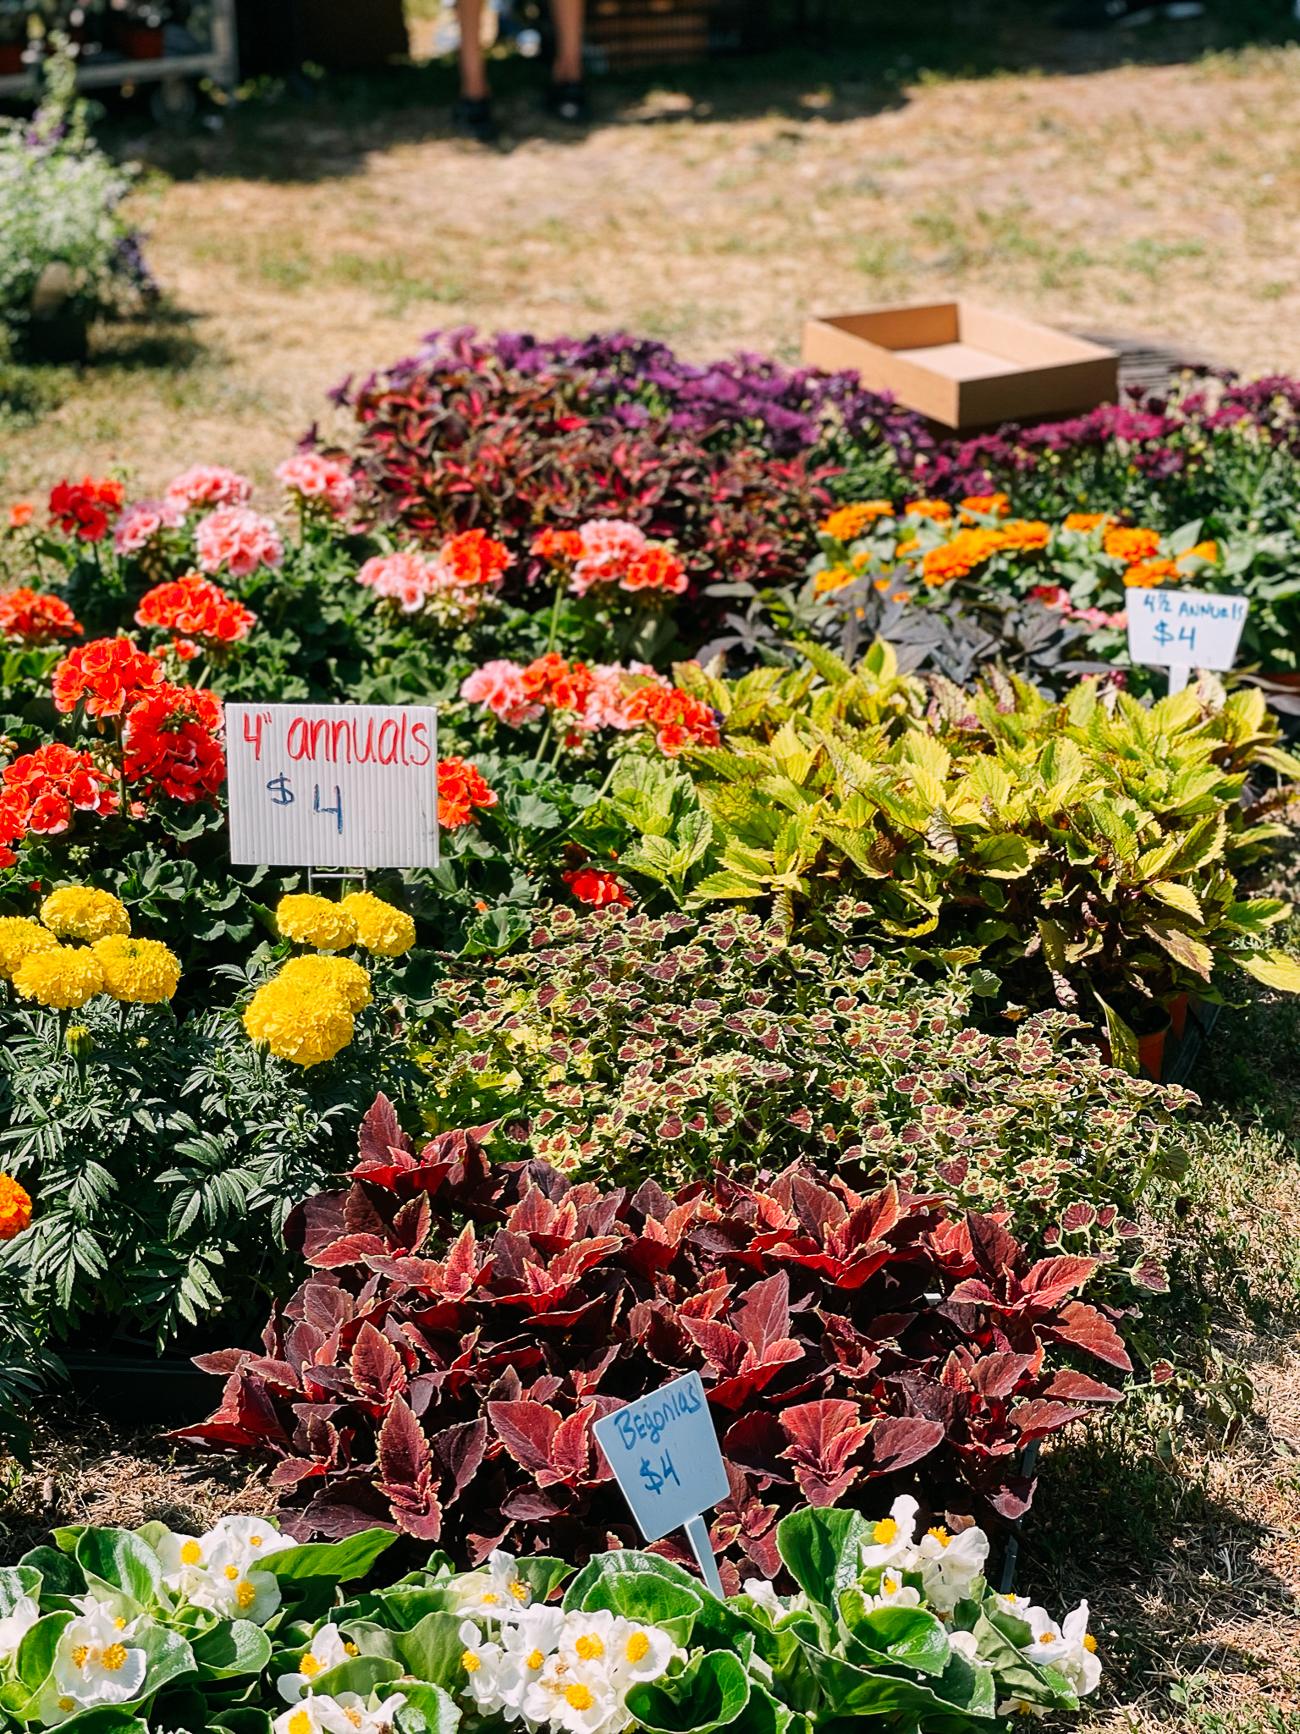 Flowers at Lincoln Park Farmer's Market